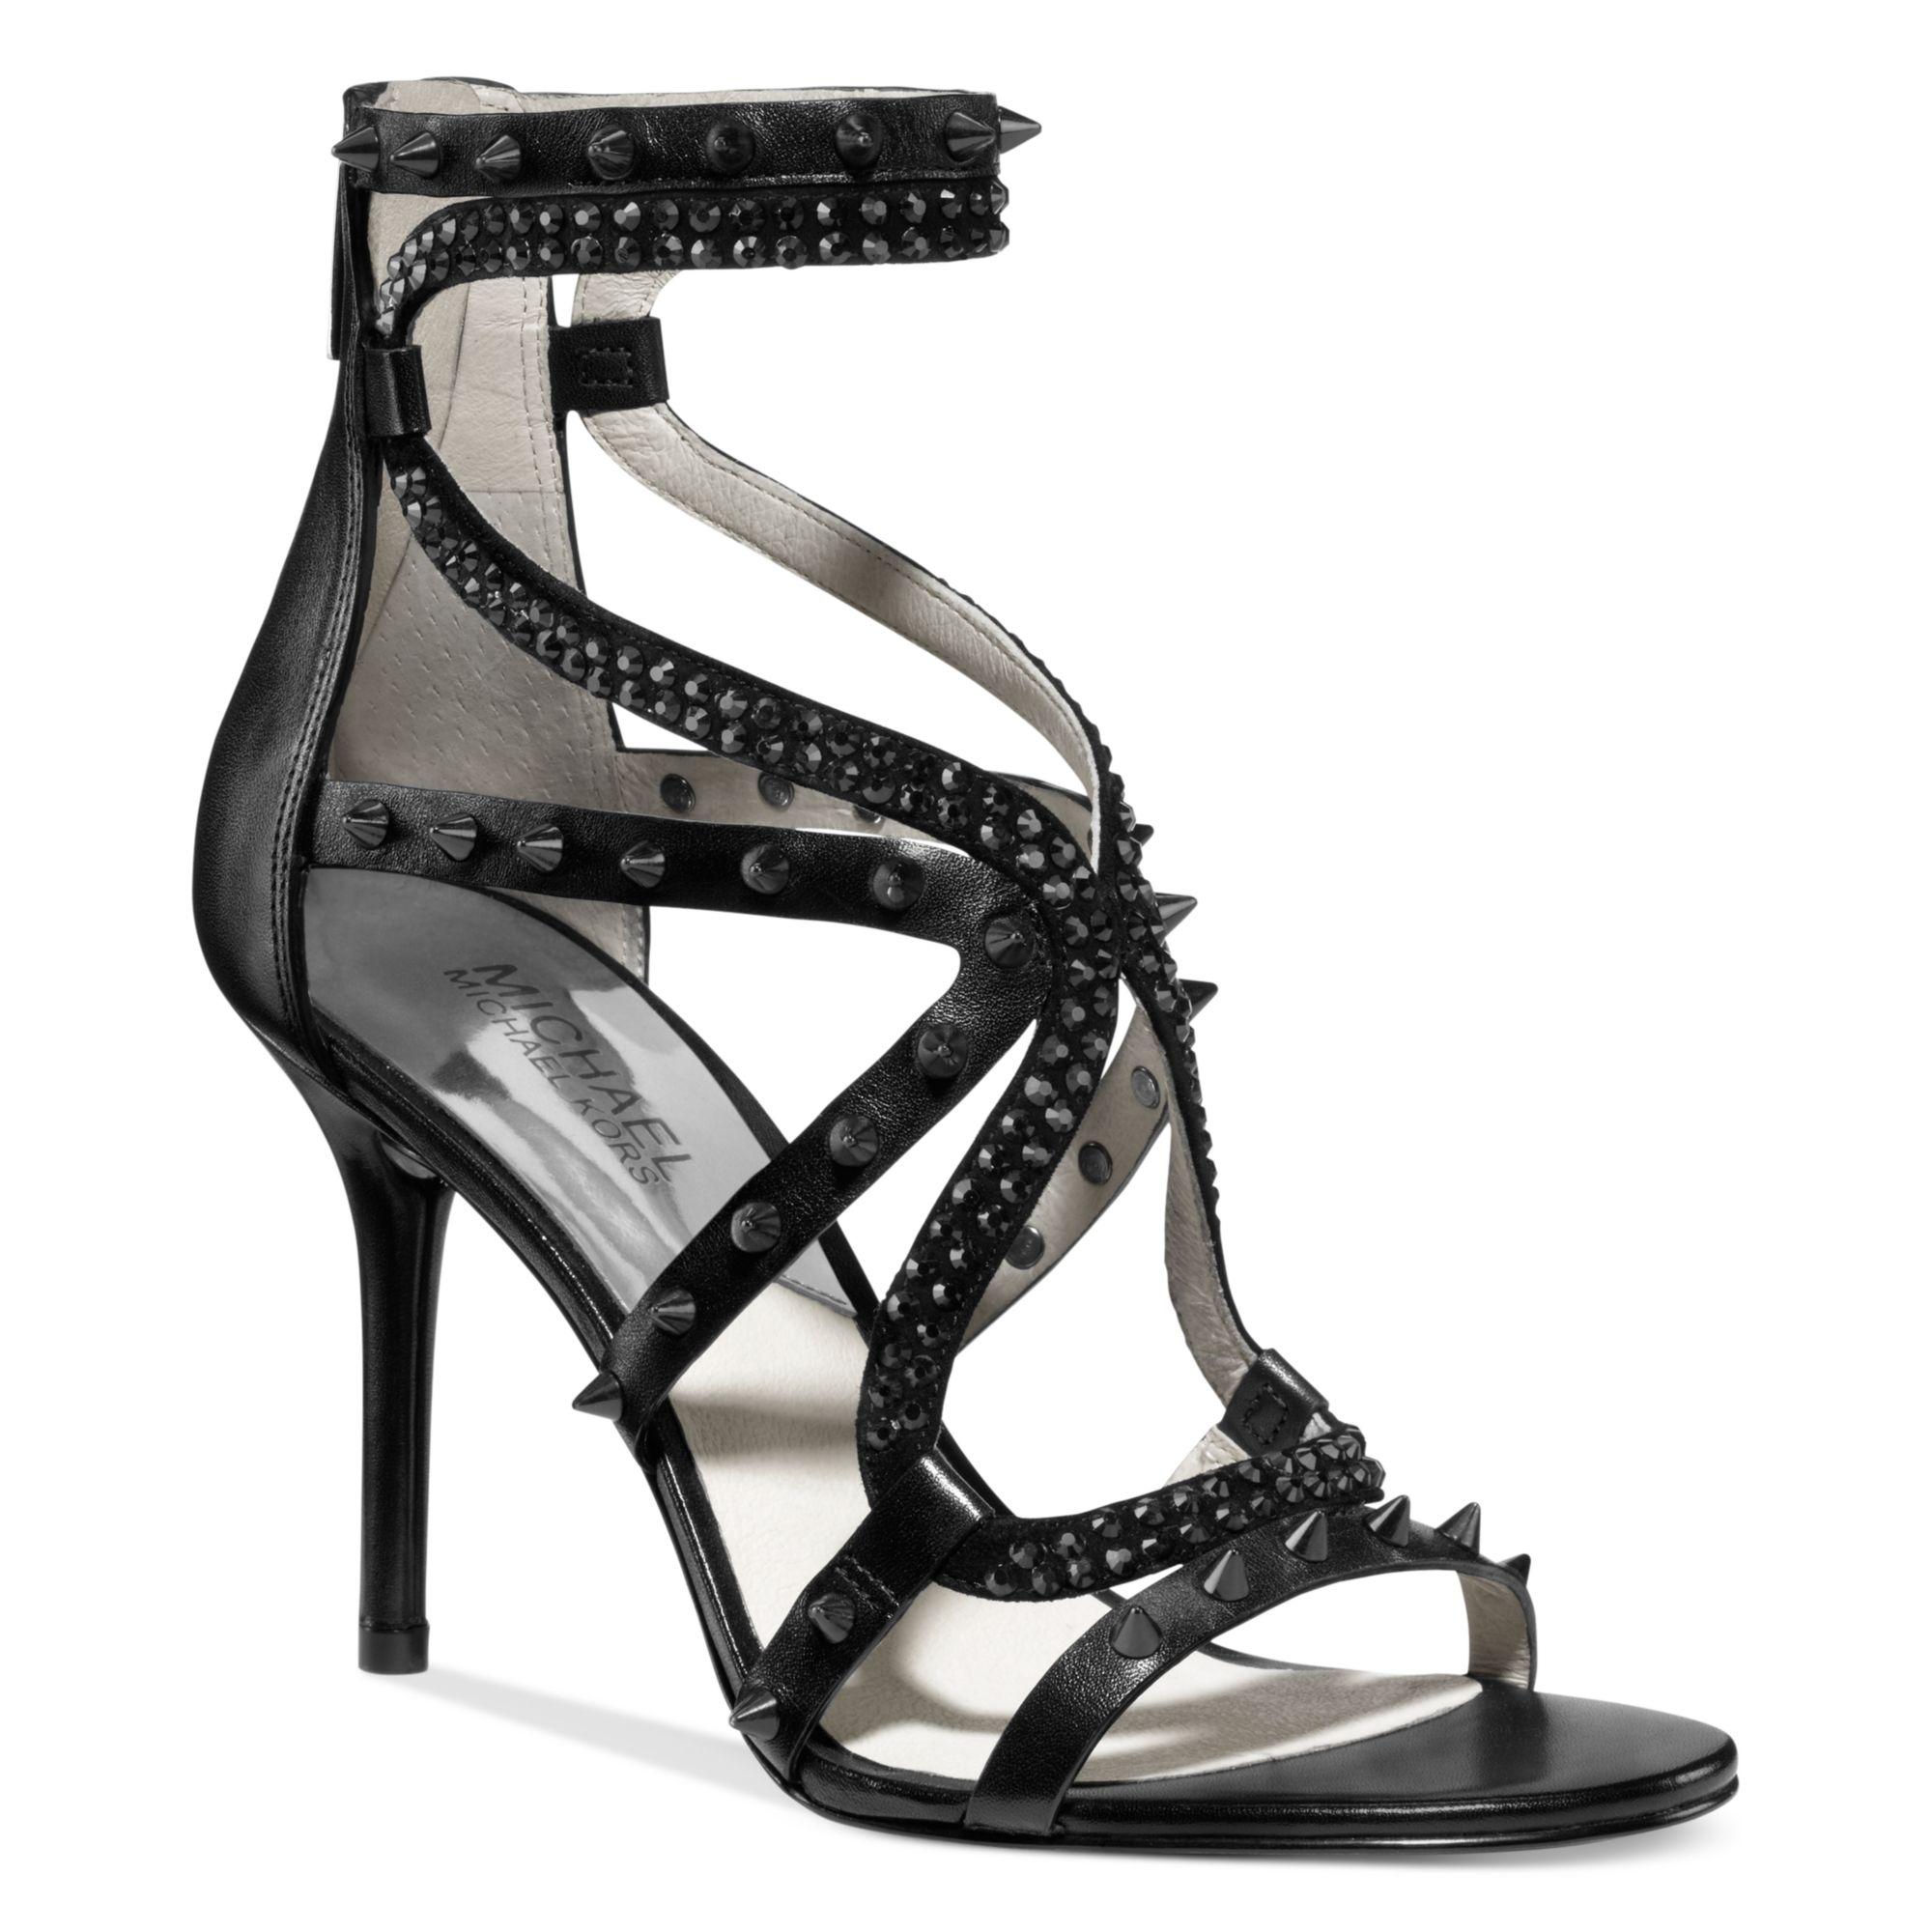 Black sandals evening - Gallery